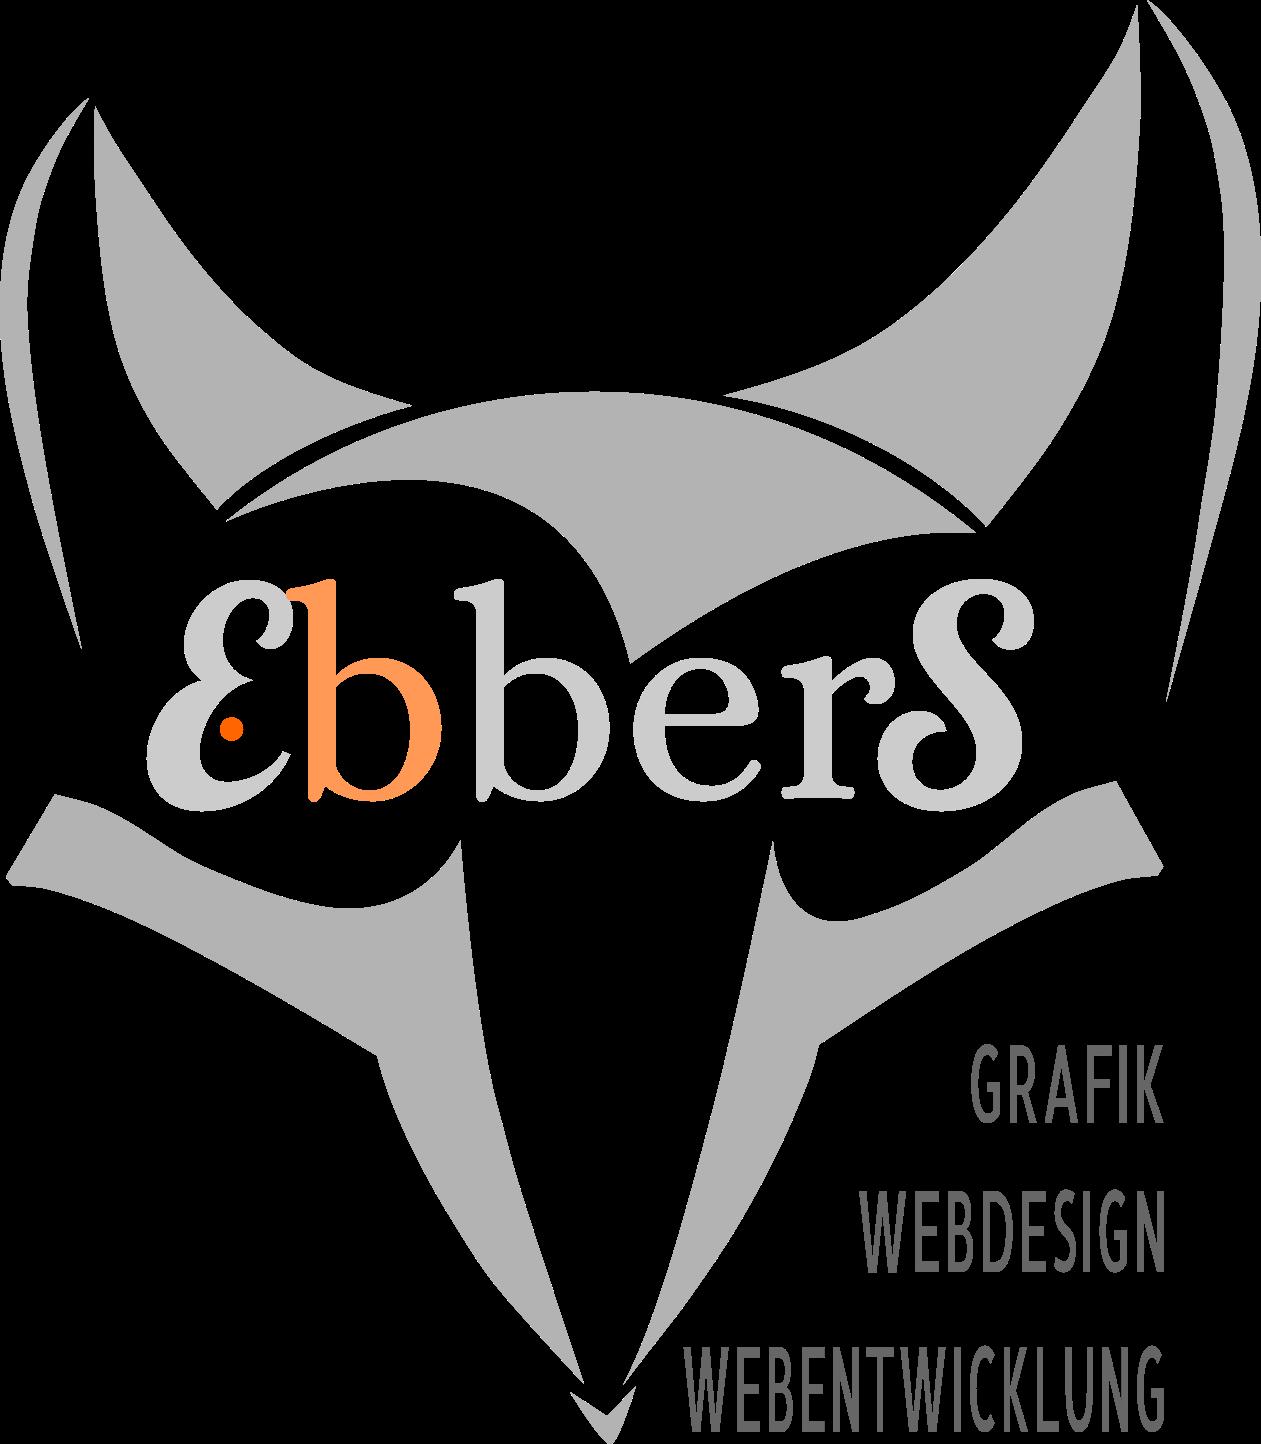 Werbeagentur Tobias Ebbers